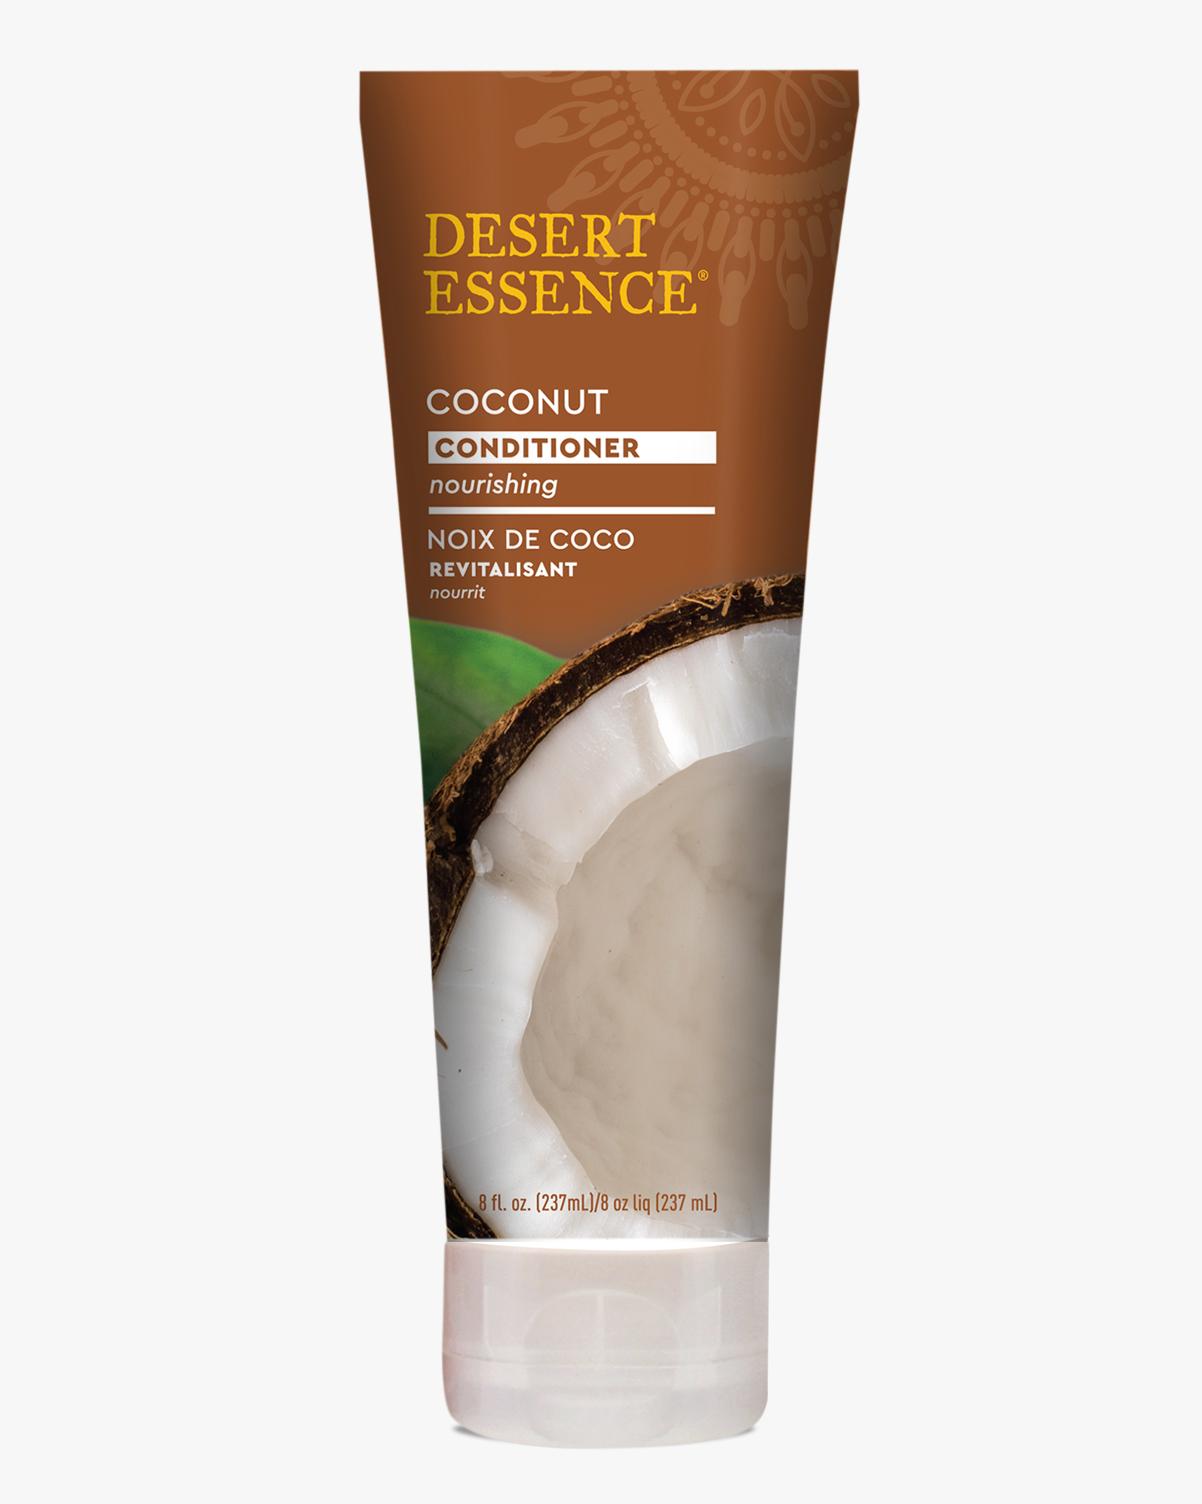 Desert Essence coupon: Desert Essence Coconut Conditioner, 8 fl. oz. | Vegan | Gluten-Free